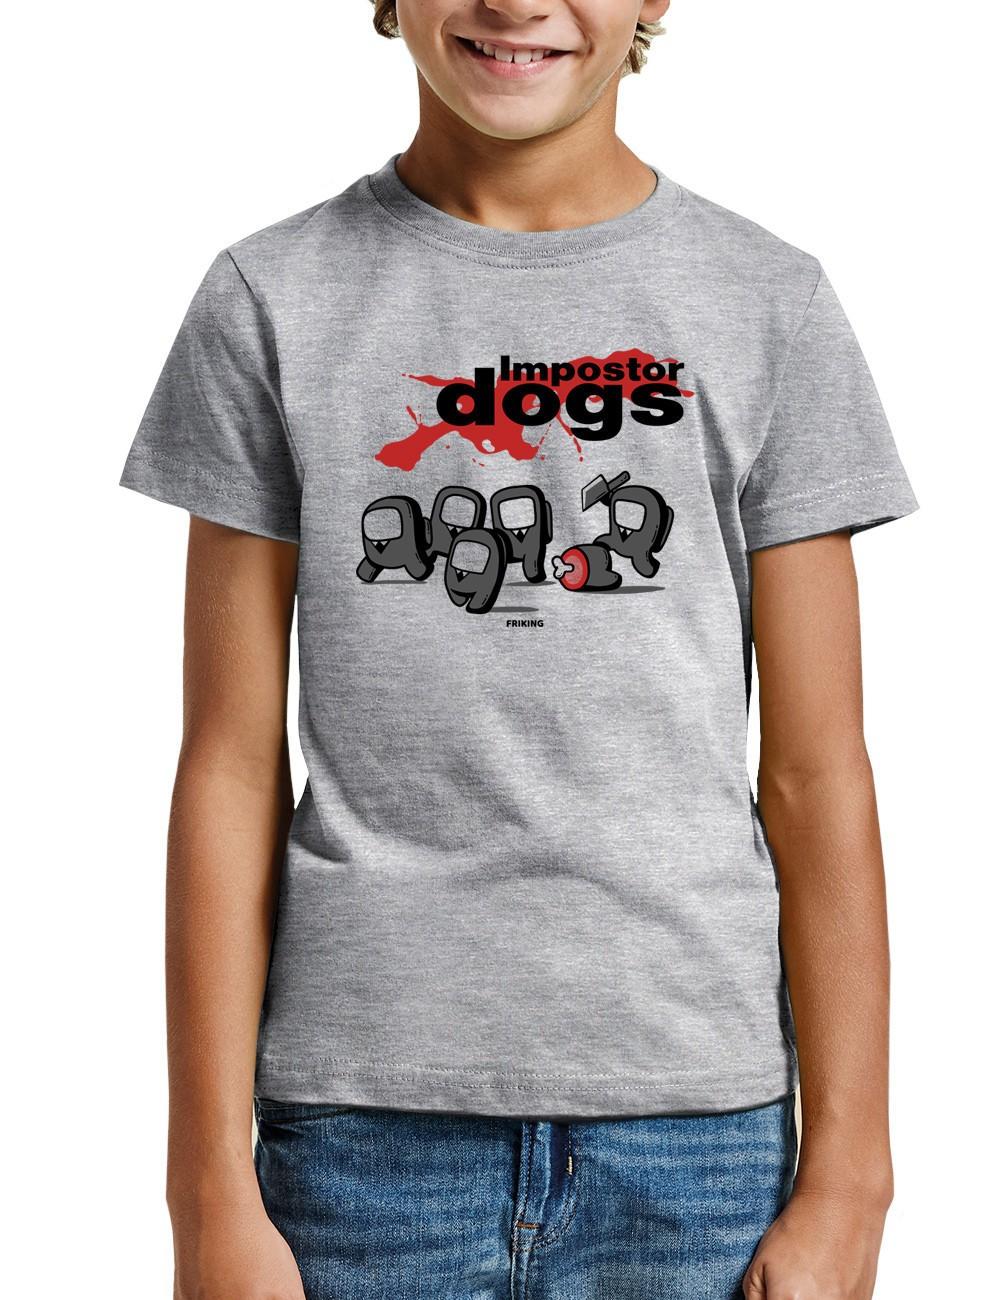 Impostor dogs